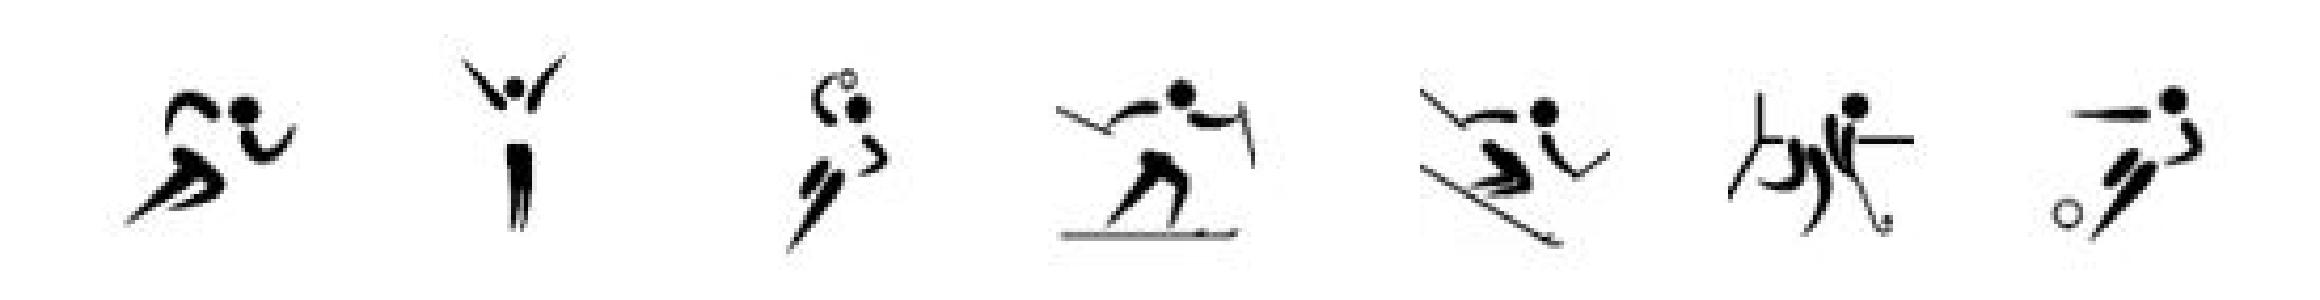 idrettsskole piktogram.JPG